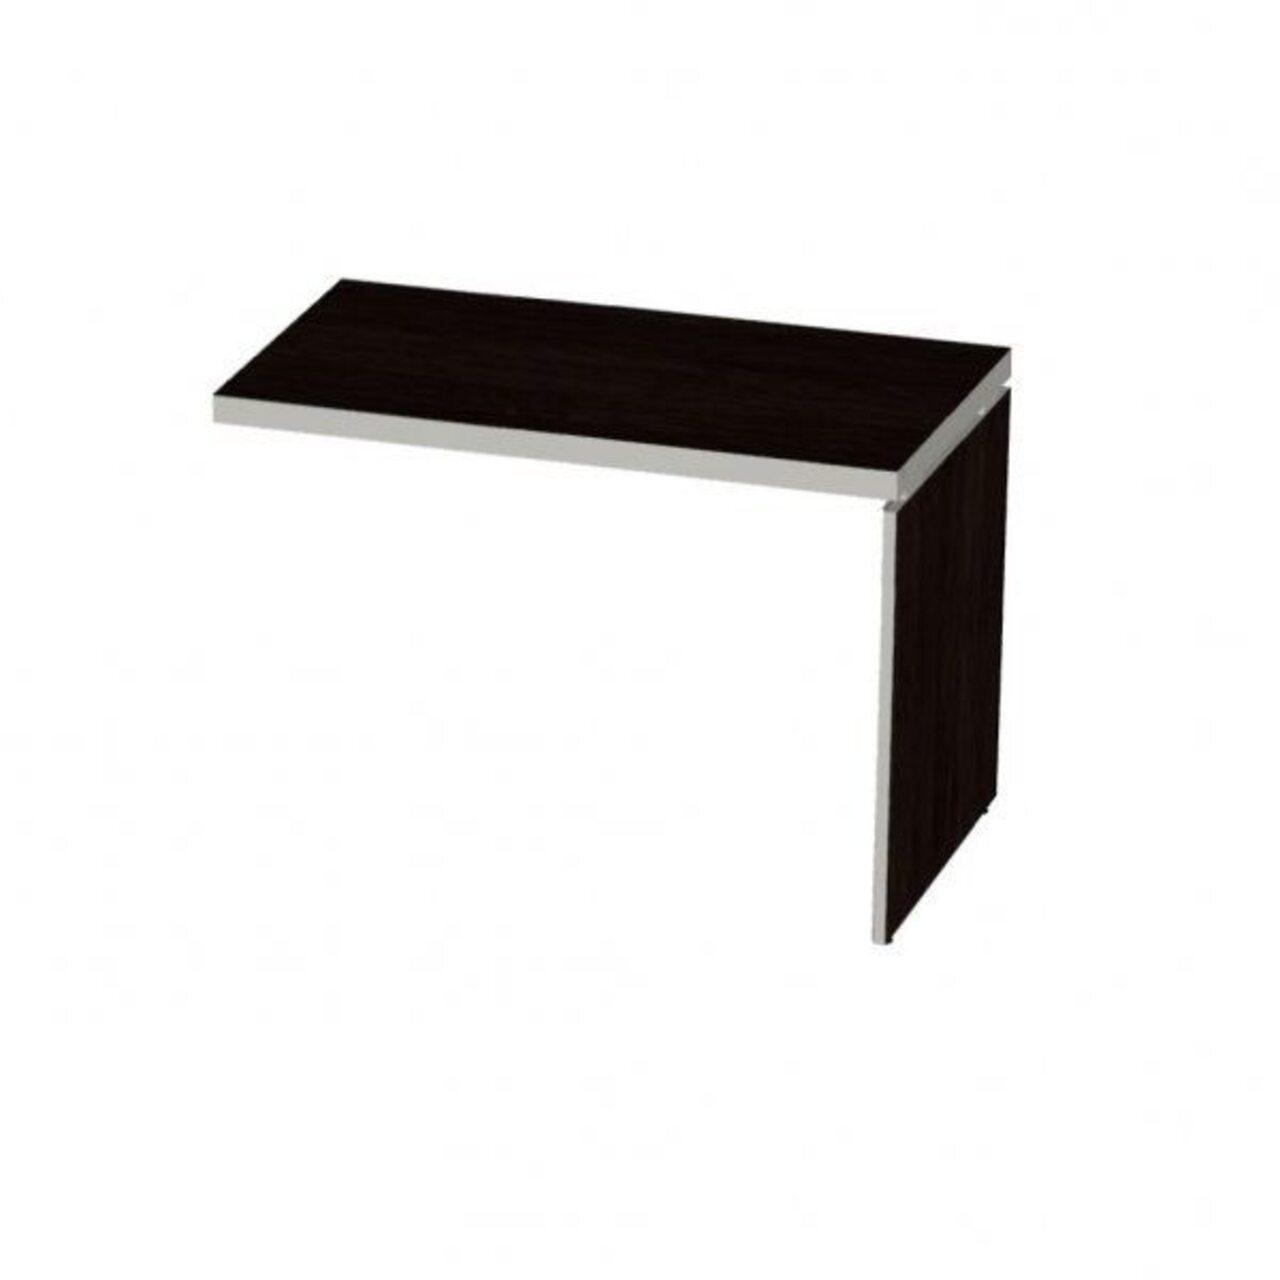 Стол приставной боковой  Bella VITA 110x55x77 - фото 2